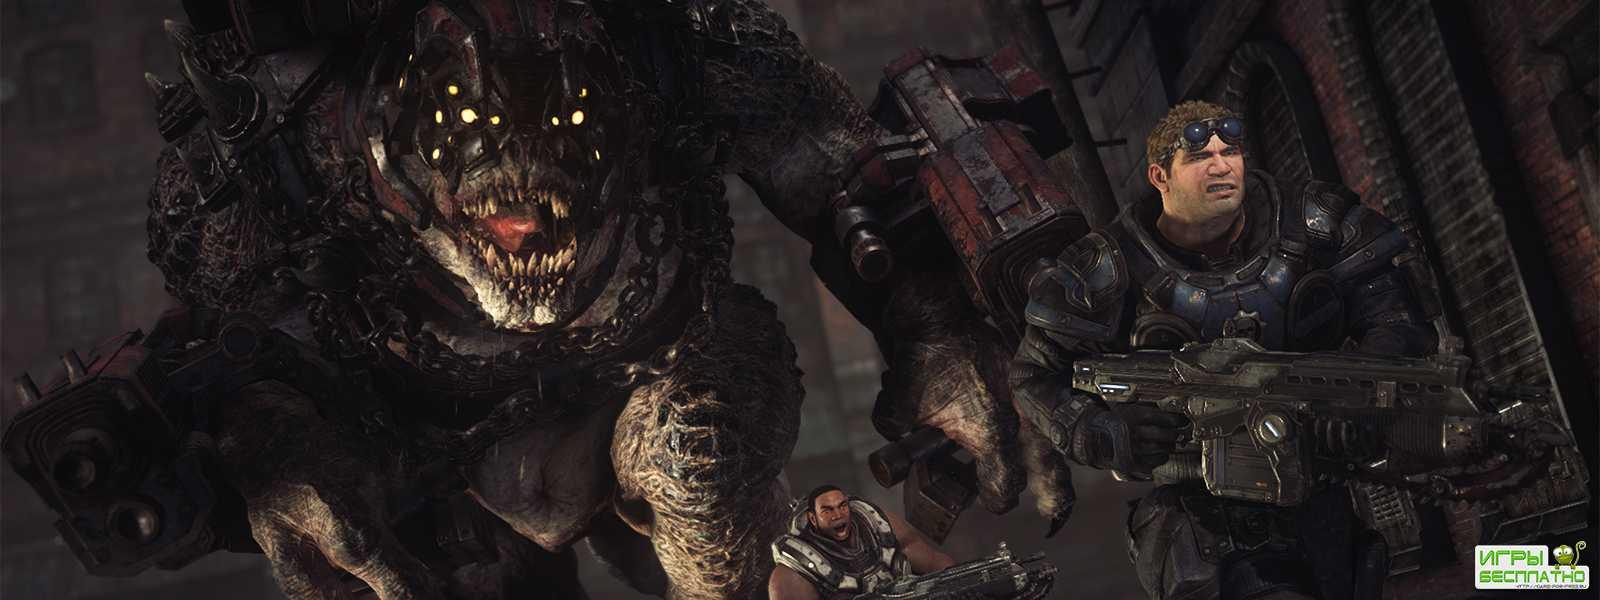 Gears of War 4 покажет графические возможности Xbox One